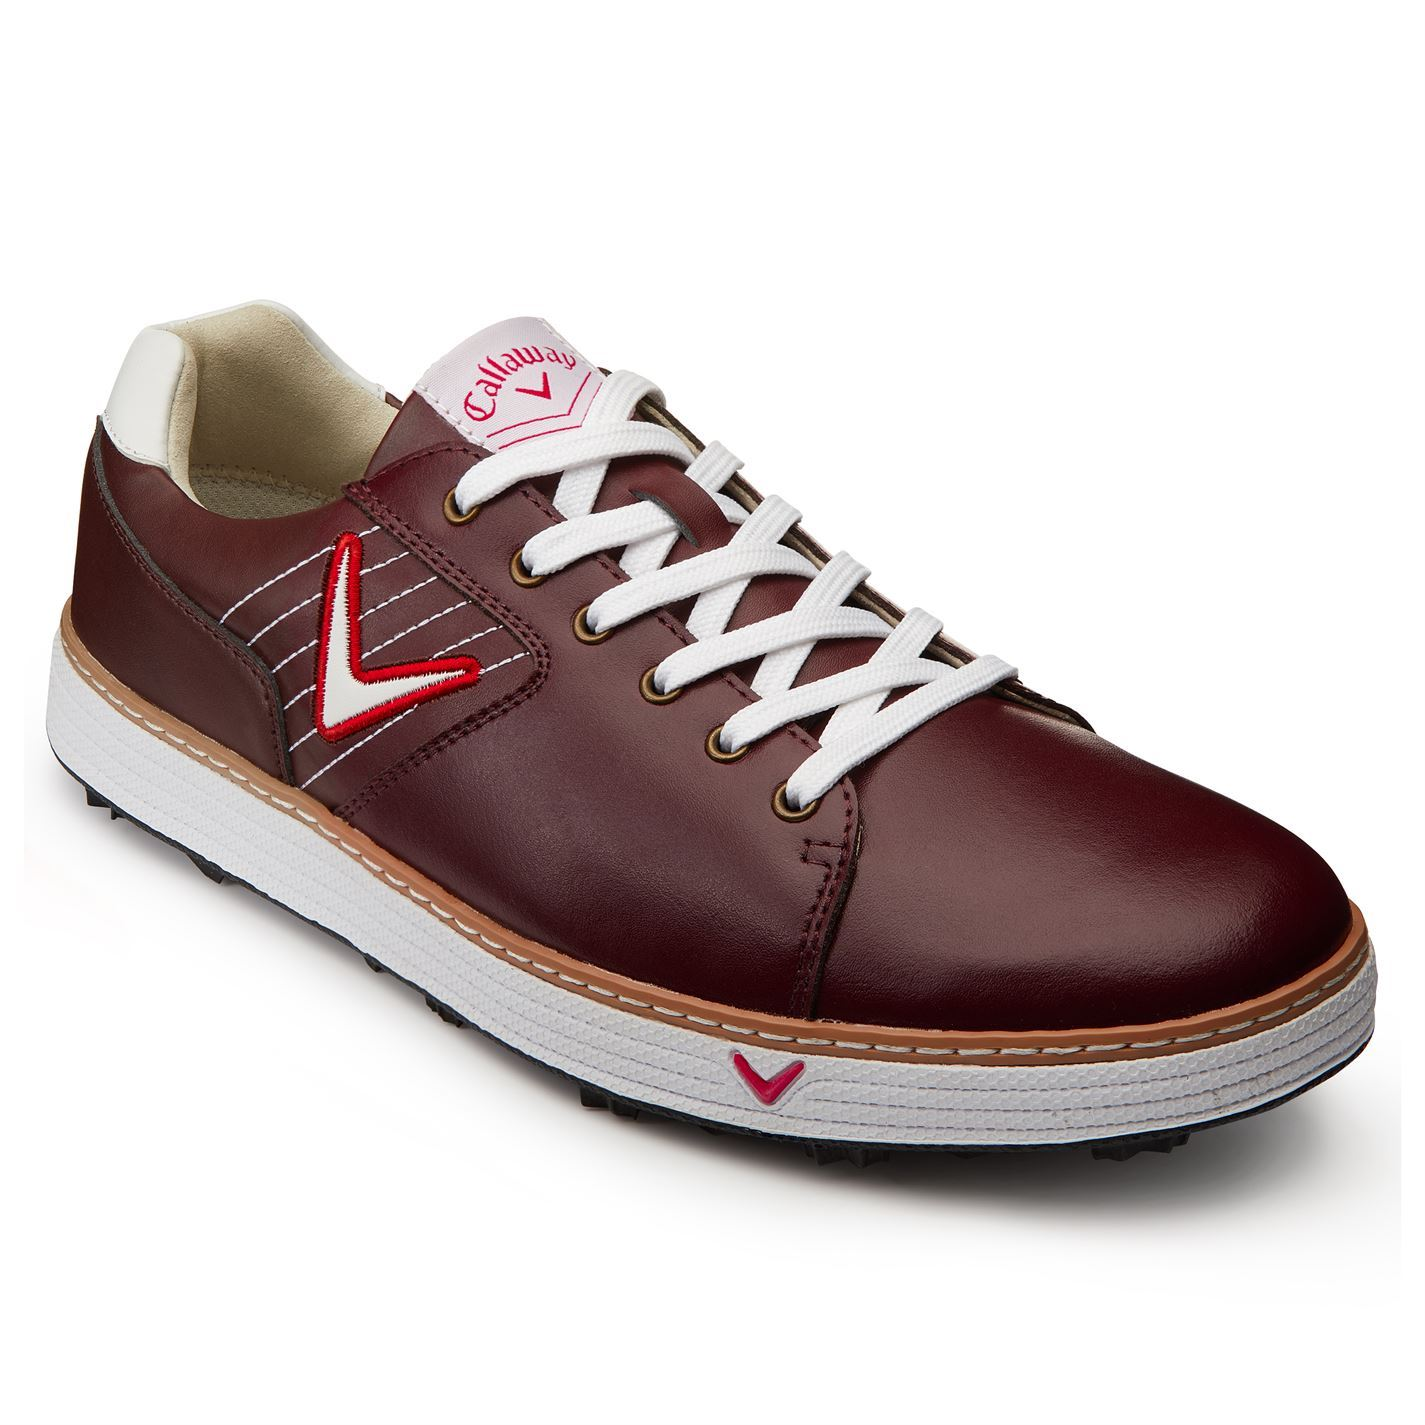 Callaway-Delmar-Urban-Golf-Shoes-Mens-Spikeless-Footwear thumbnail 10